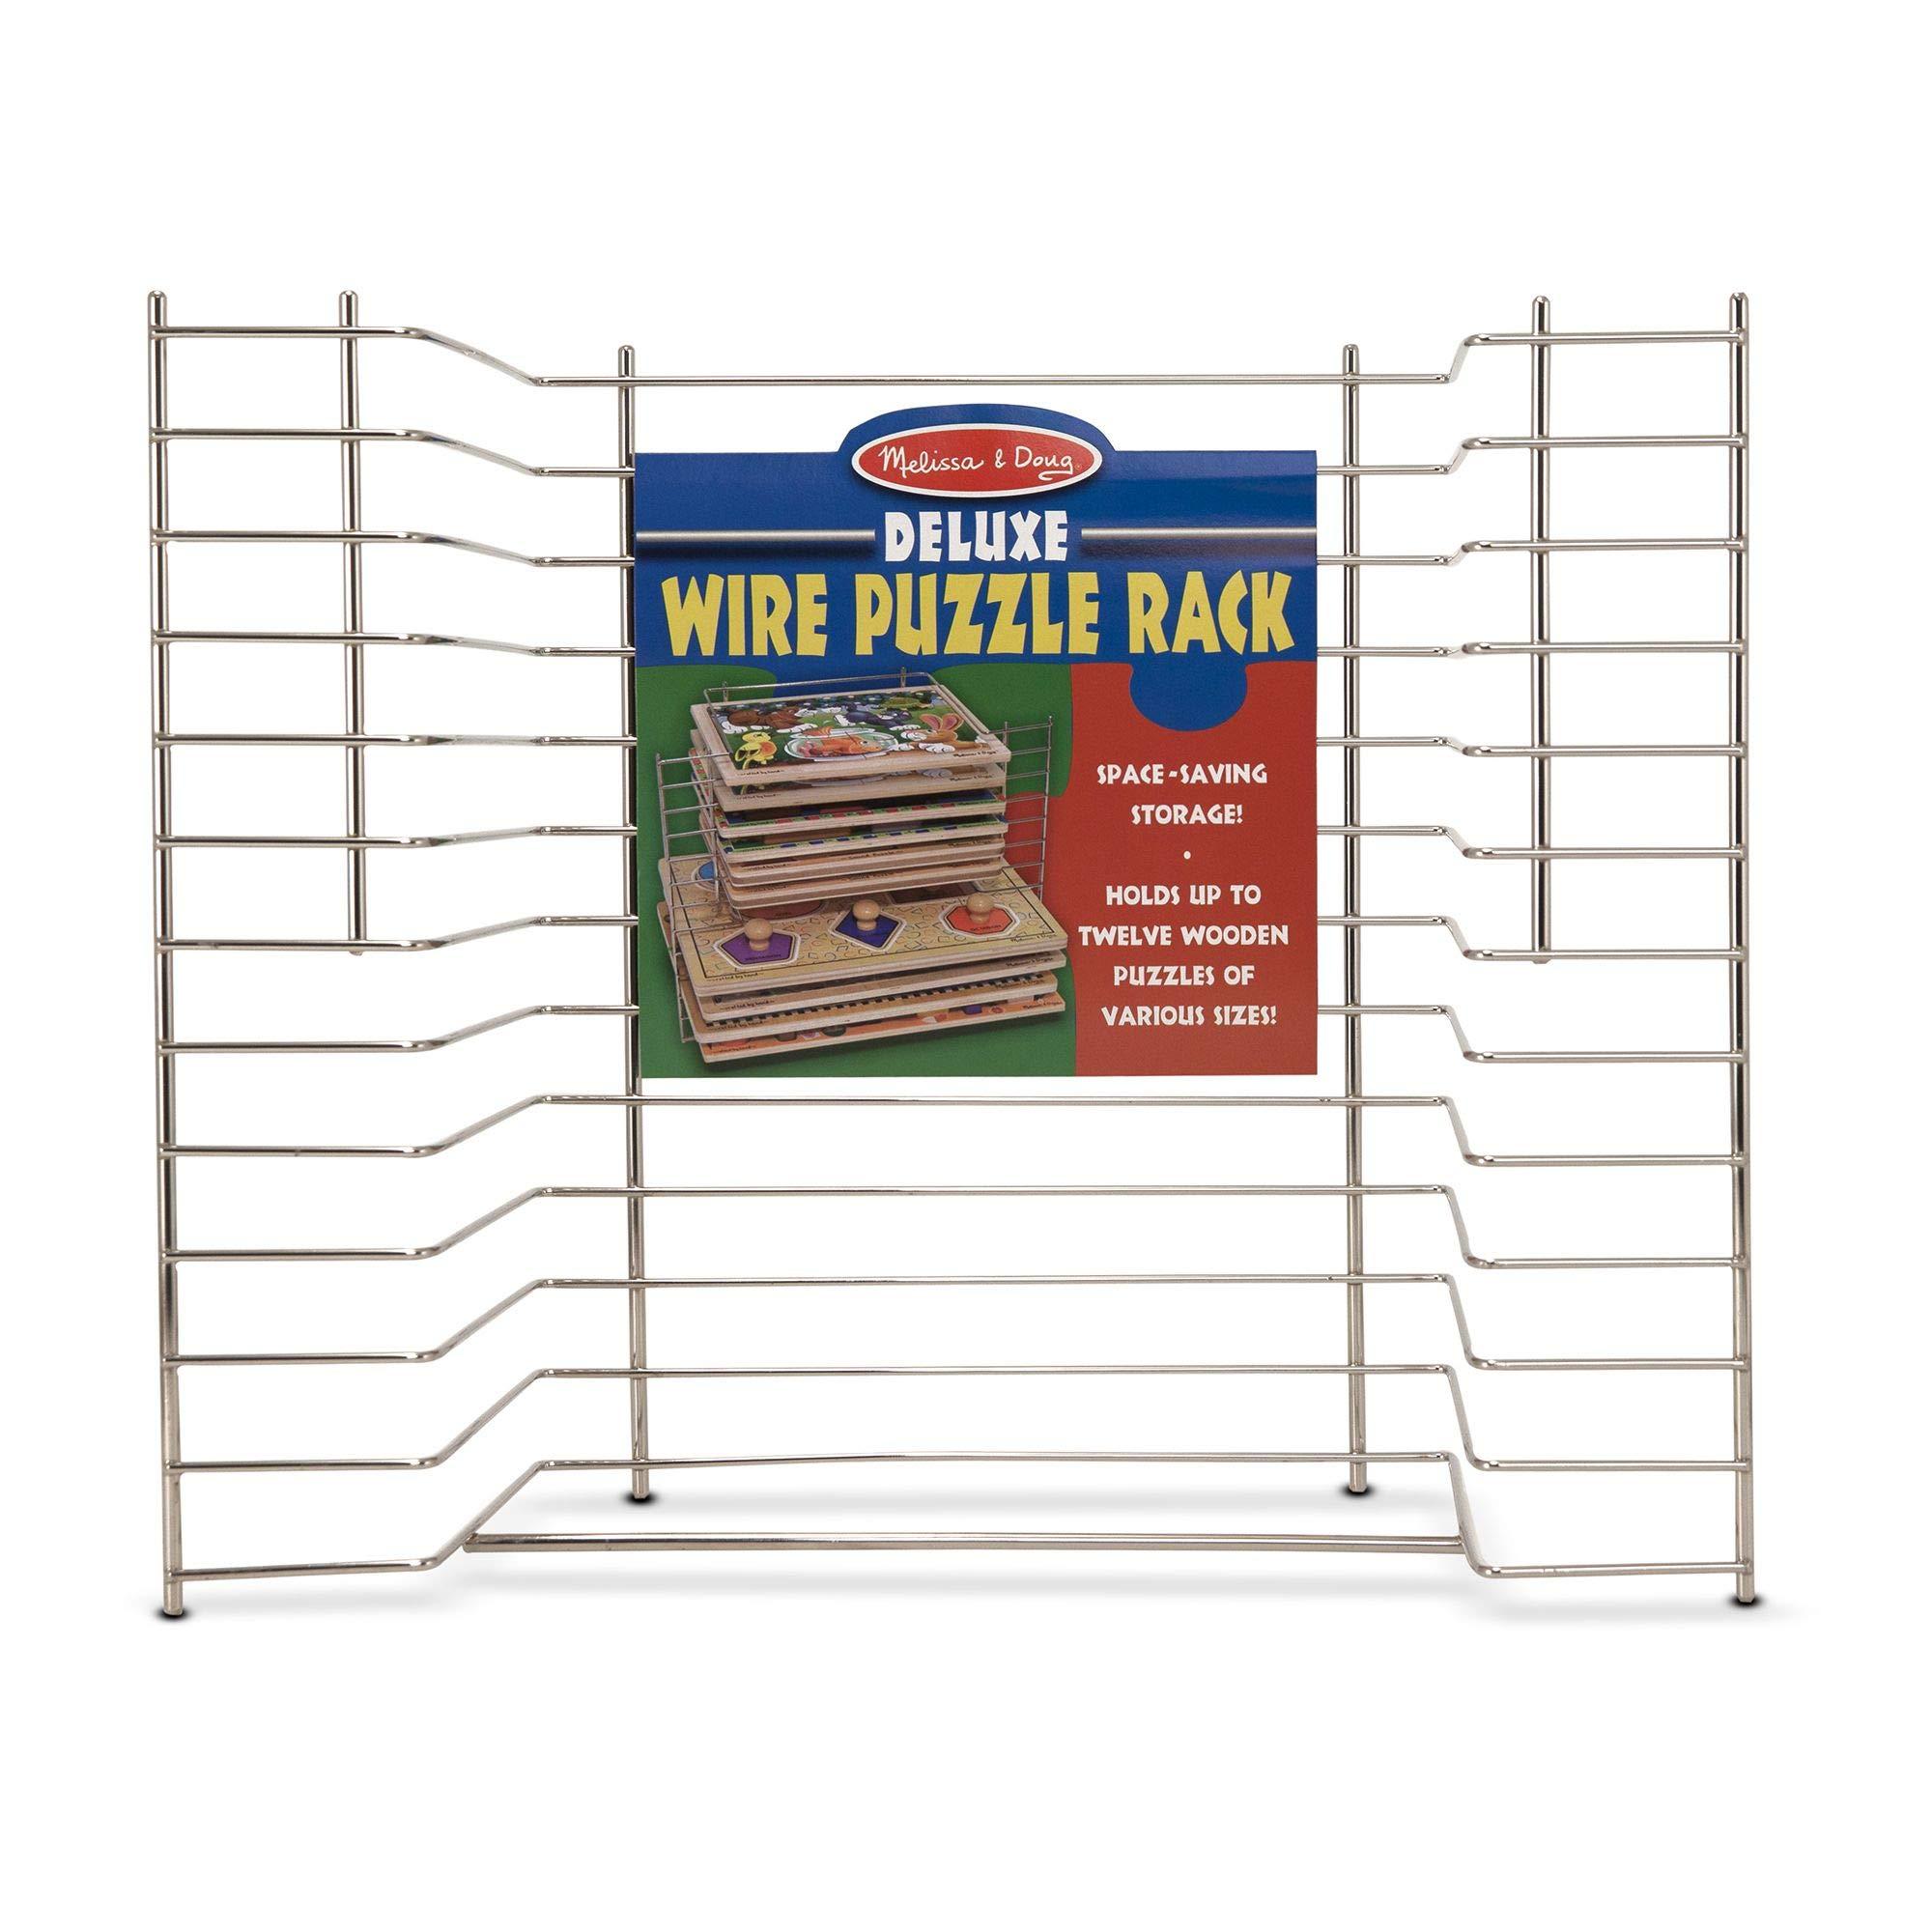 "Melissa & Doug Deluxe Wire Puzzle Storage Rack, Sturdy Metal Construction, Pre-assembled, Wooden Puzzle Storage, 16.5"" H x 13.2"" W x 8.2"" L"